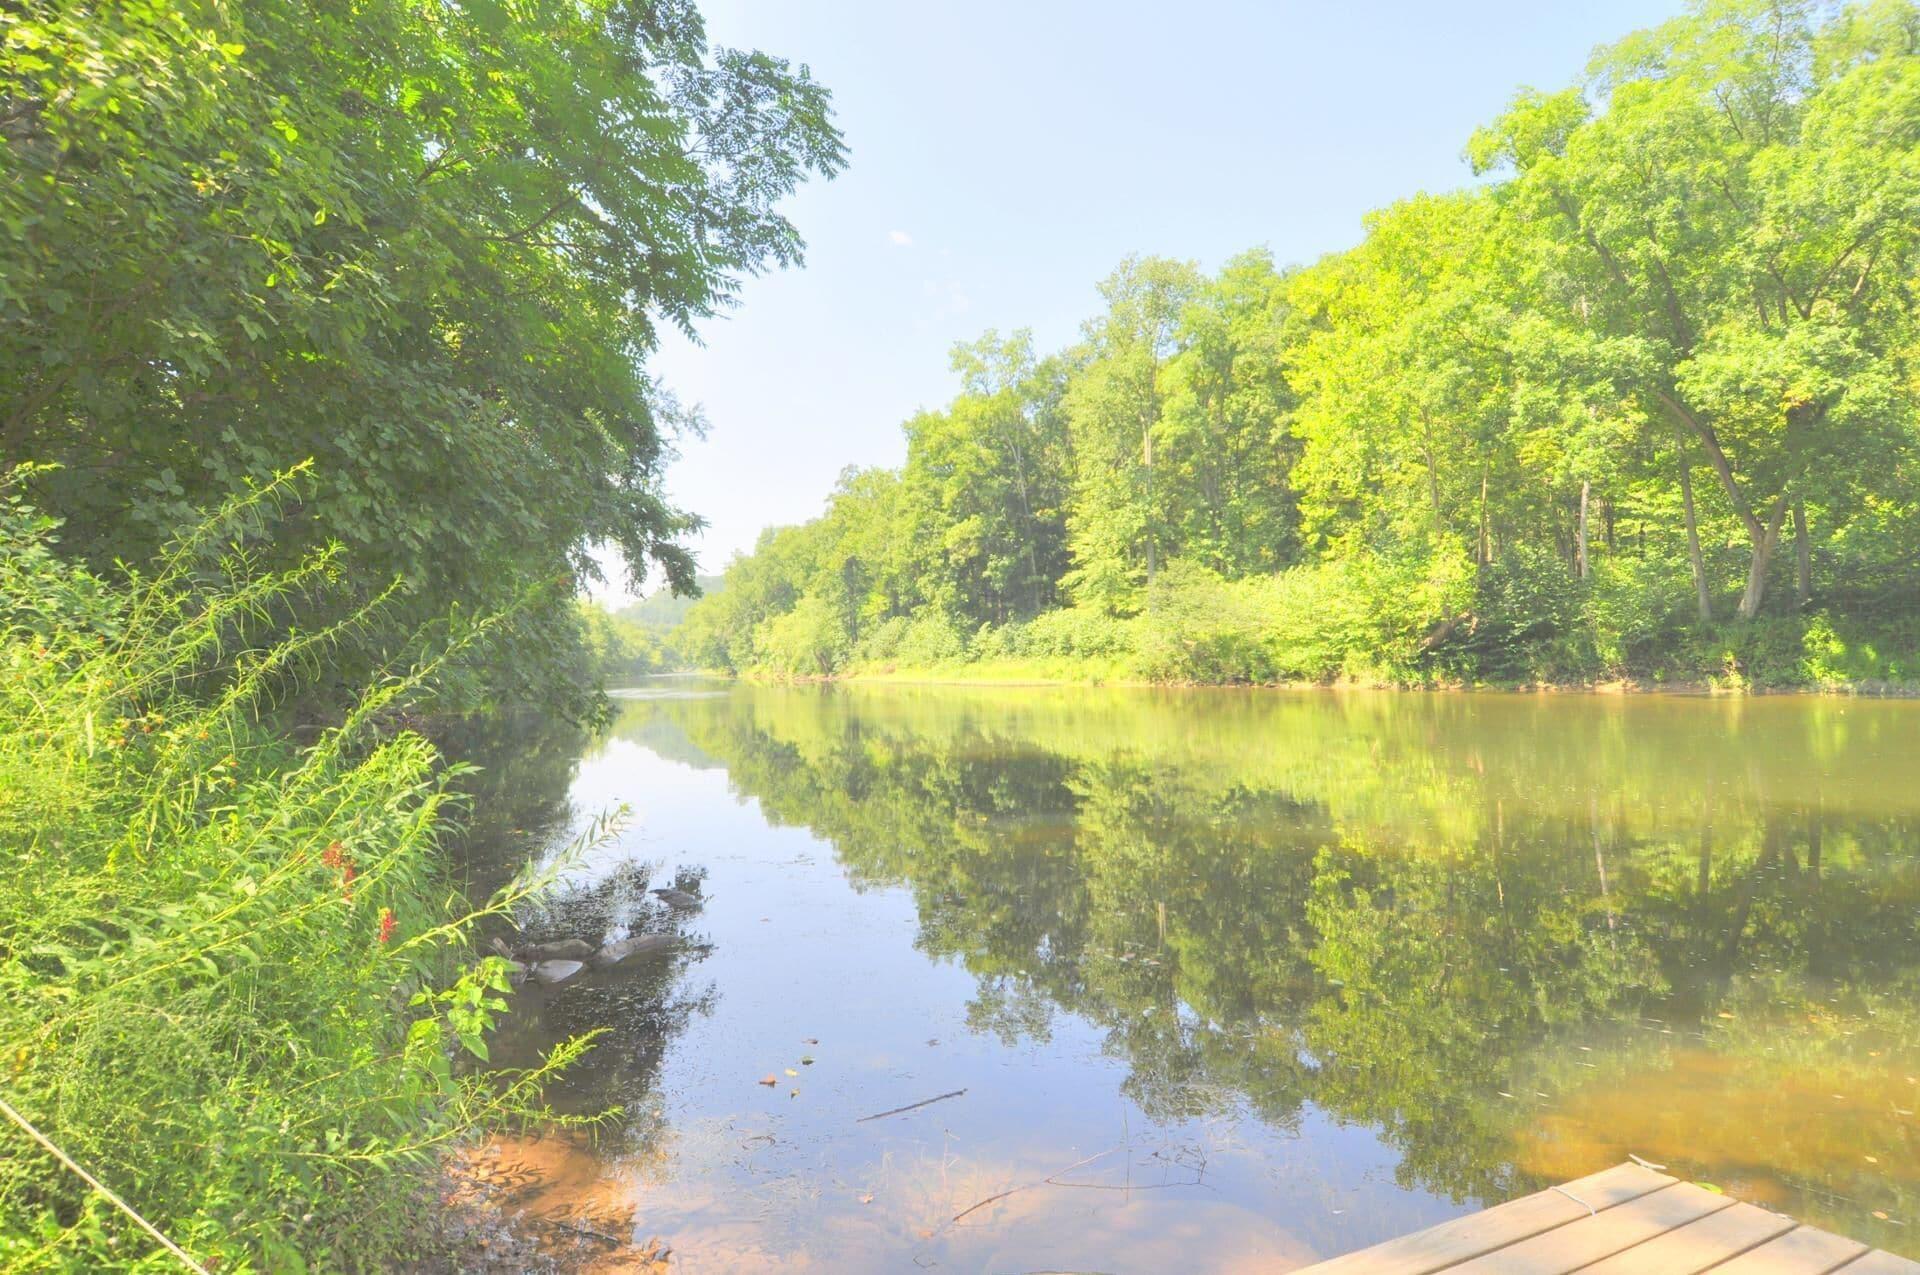 River Song, Morgan